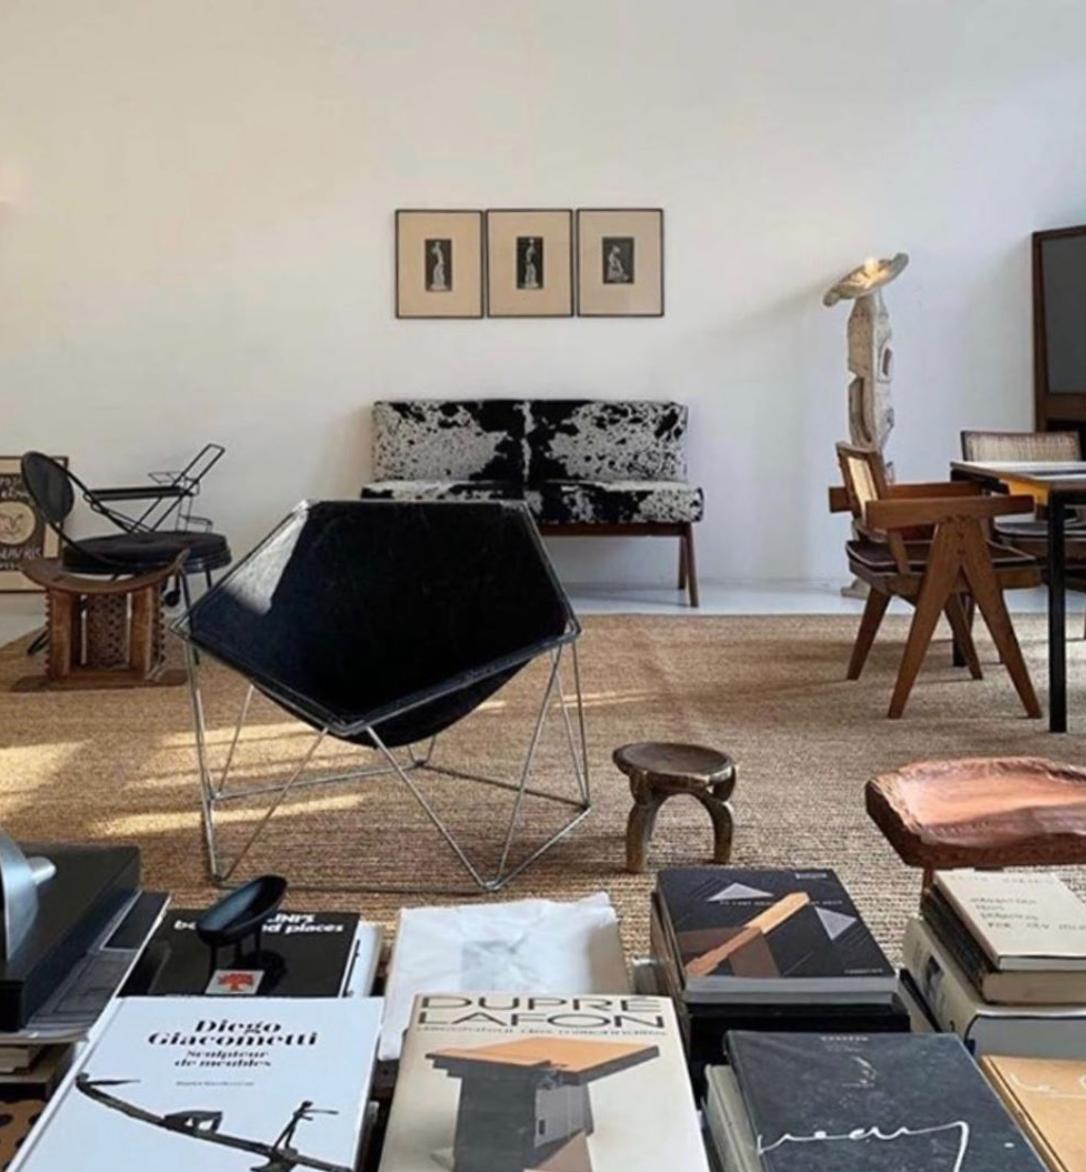 #heaven @michaelbargo #books #modernism #midcenturymodern #interiors #interiordesign #design #frenchmodernism #pierrejeanneret #homedecor #decor #lifestyle #instadaily #inspiration